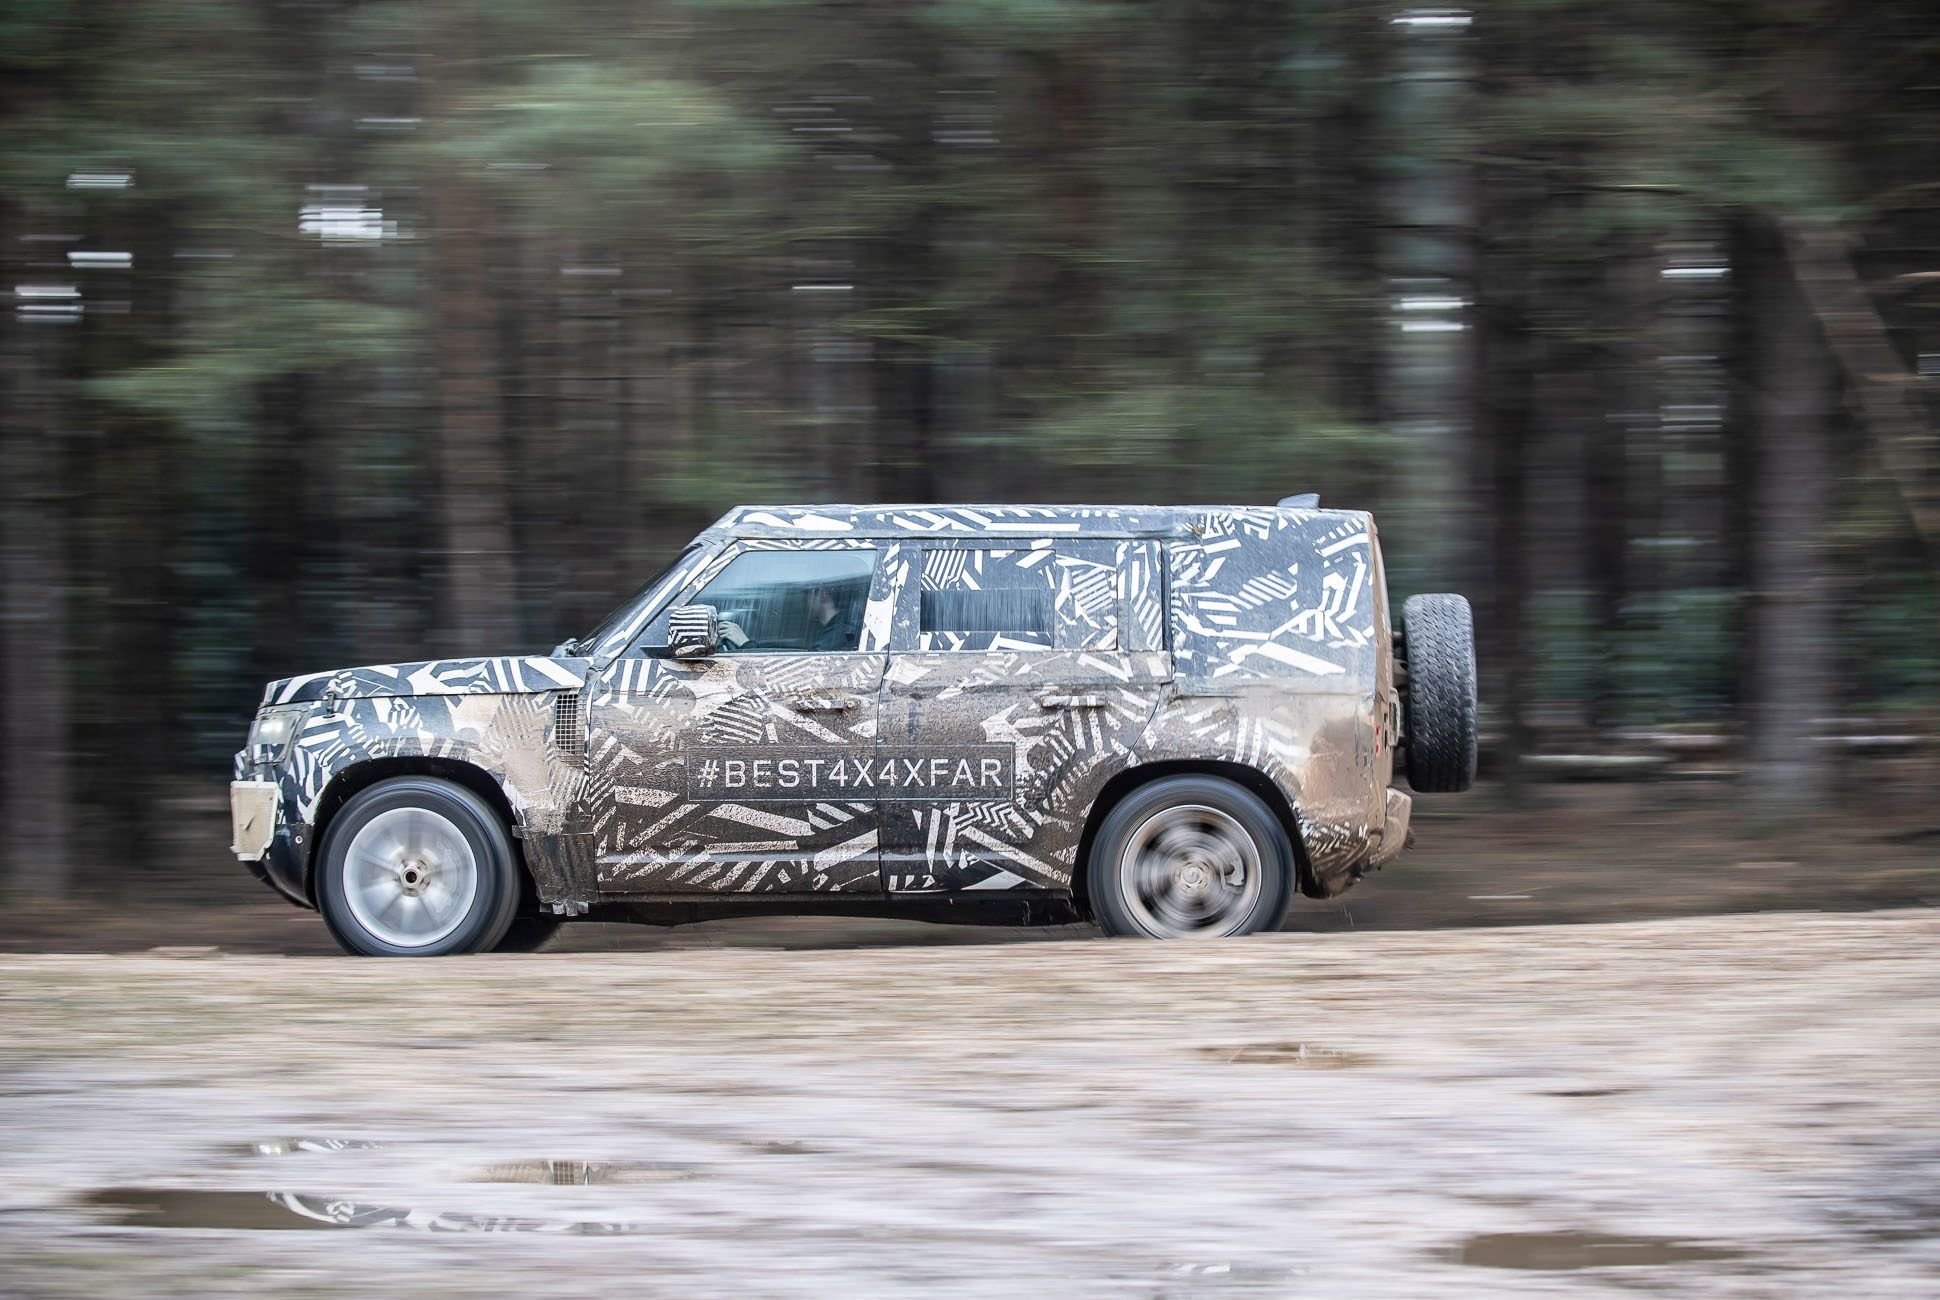 Land Rover Defender Land Rover Day Gear Patrol Slide 02